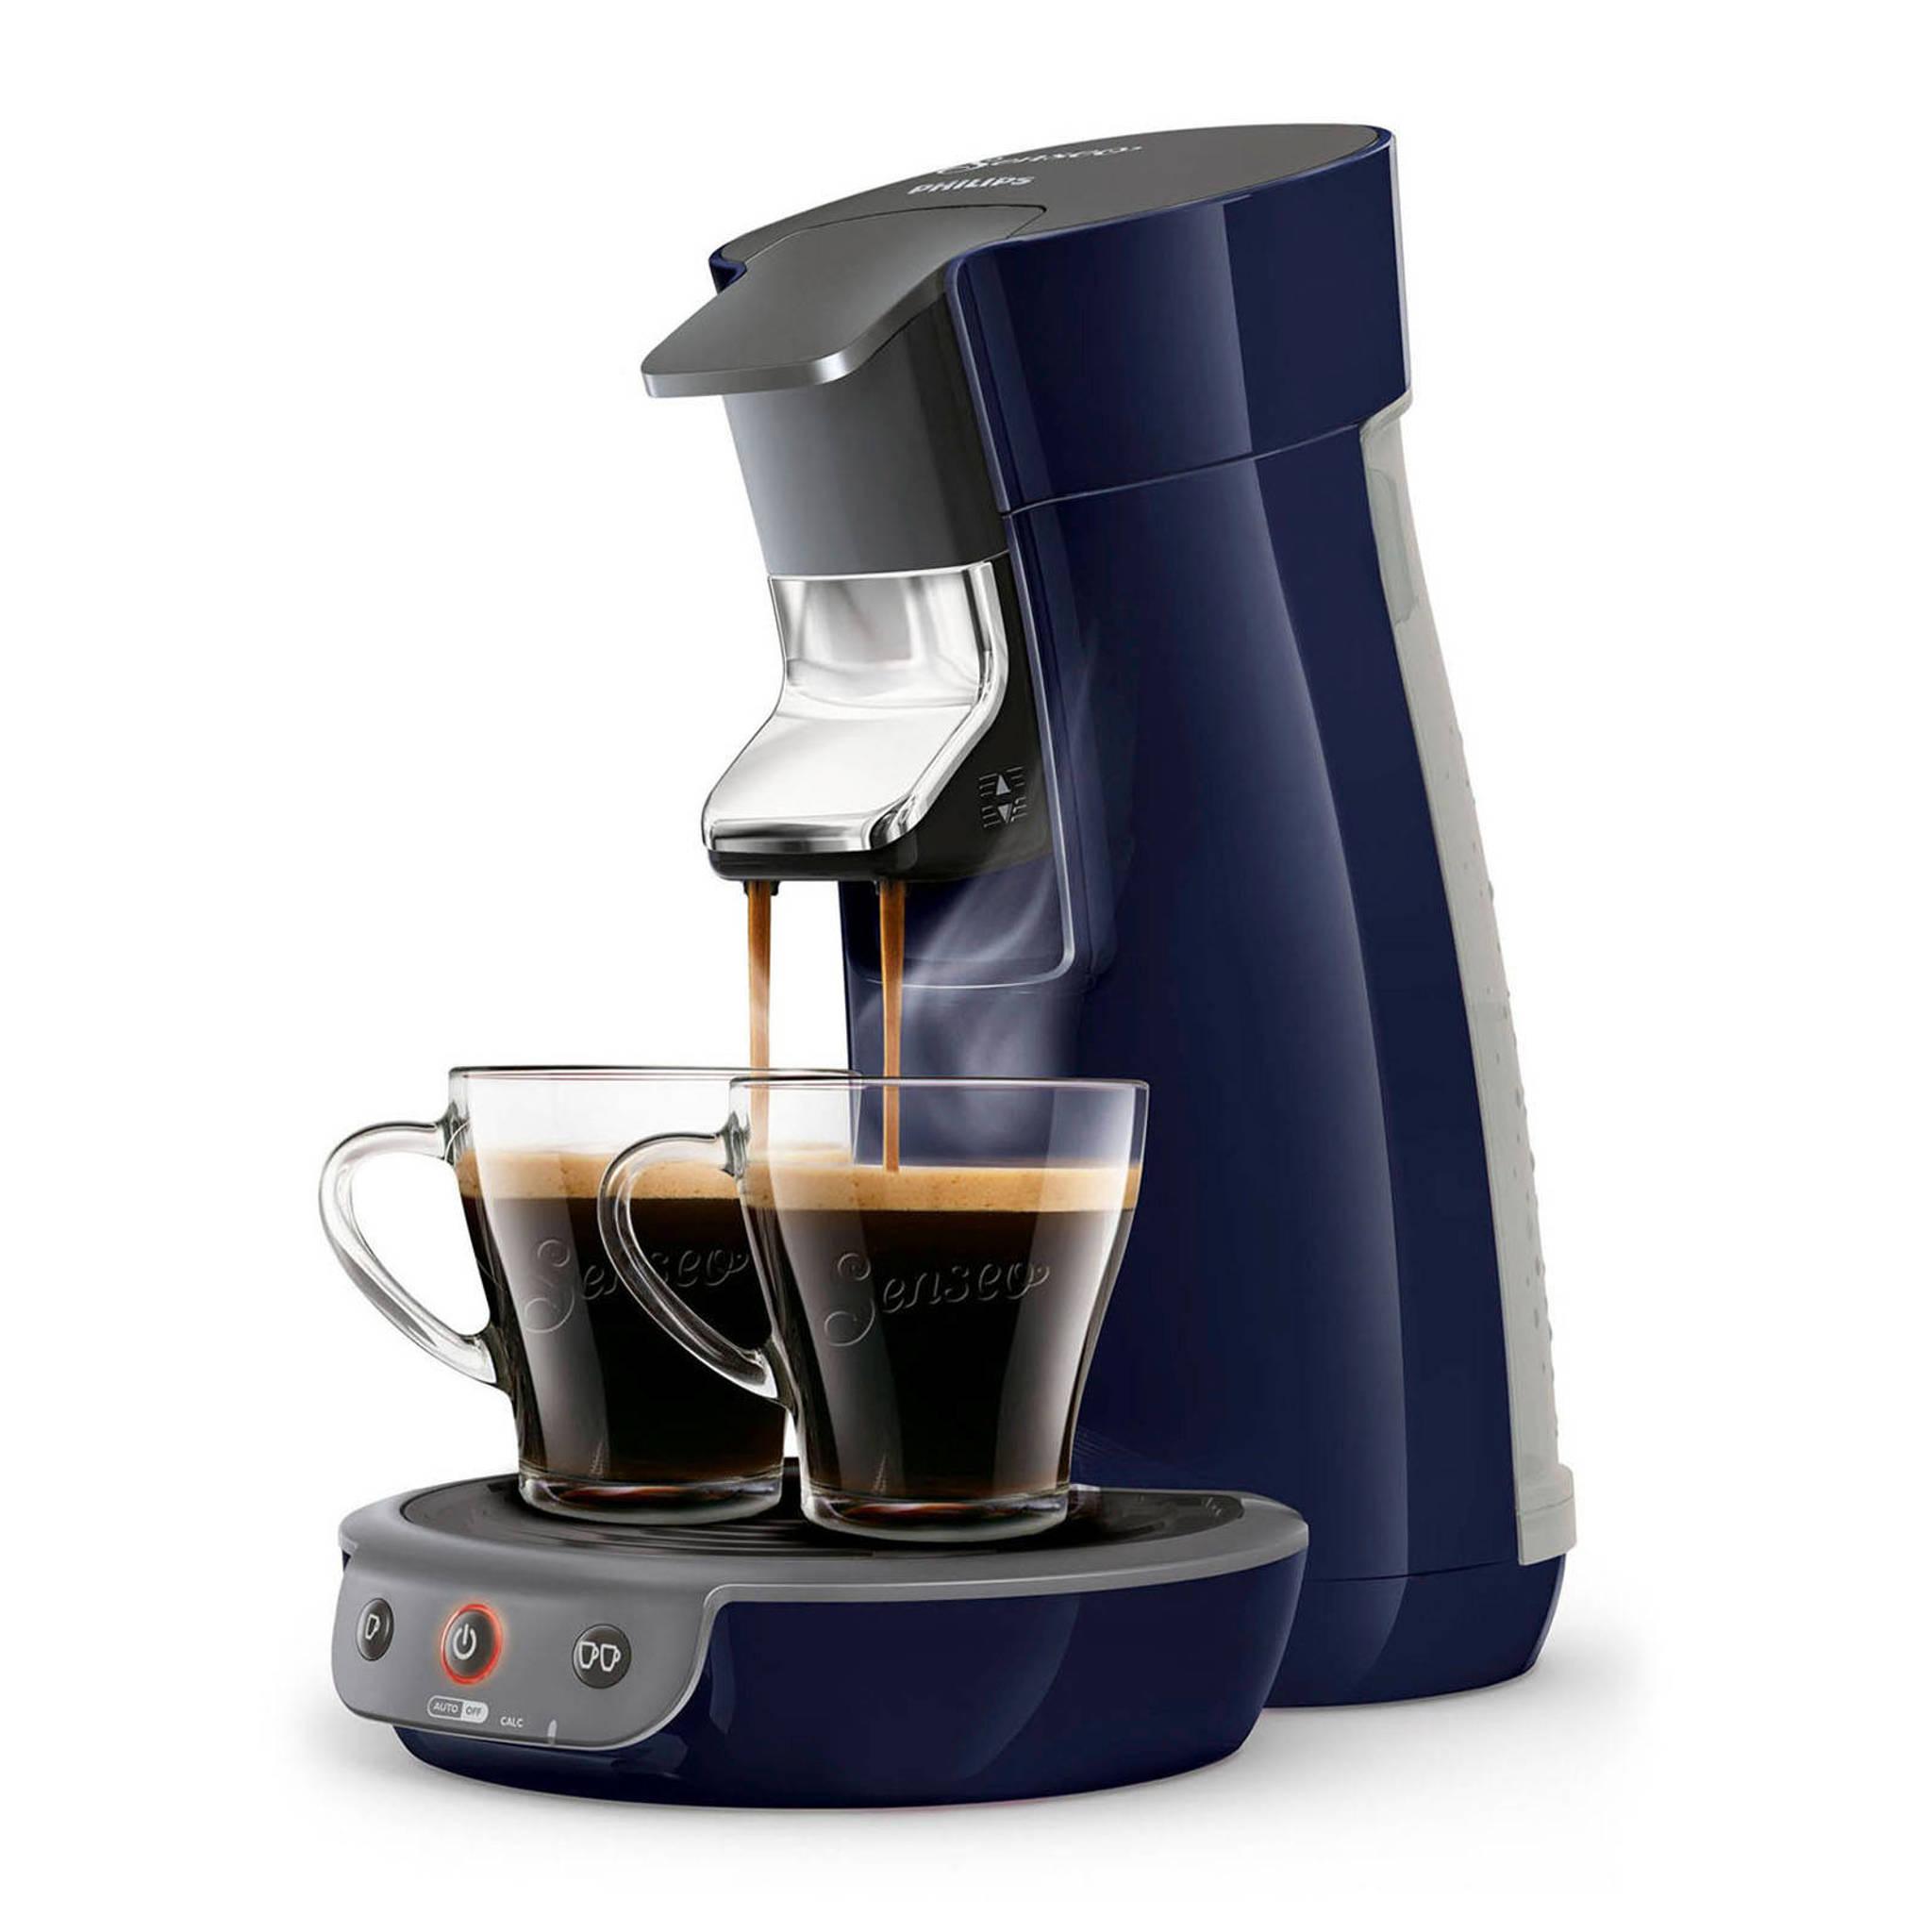 Top Philips Senseo Viva Café koffiezetapparaat HD6561/70 | wehkamp NO27